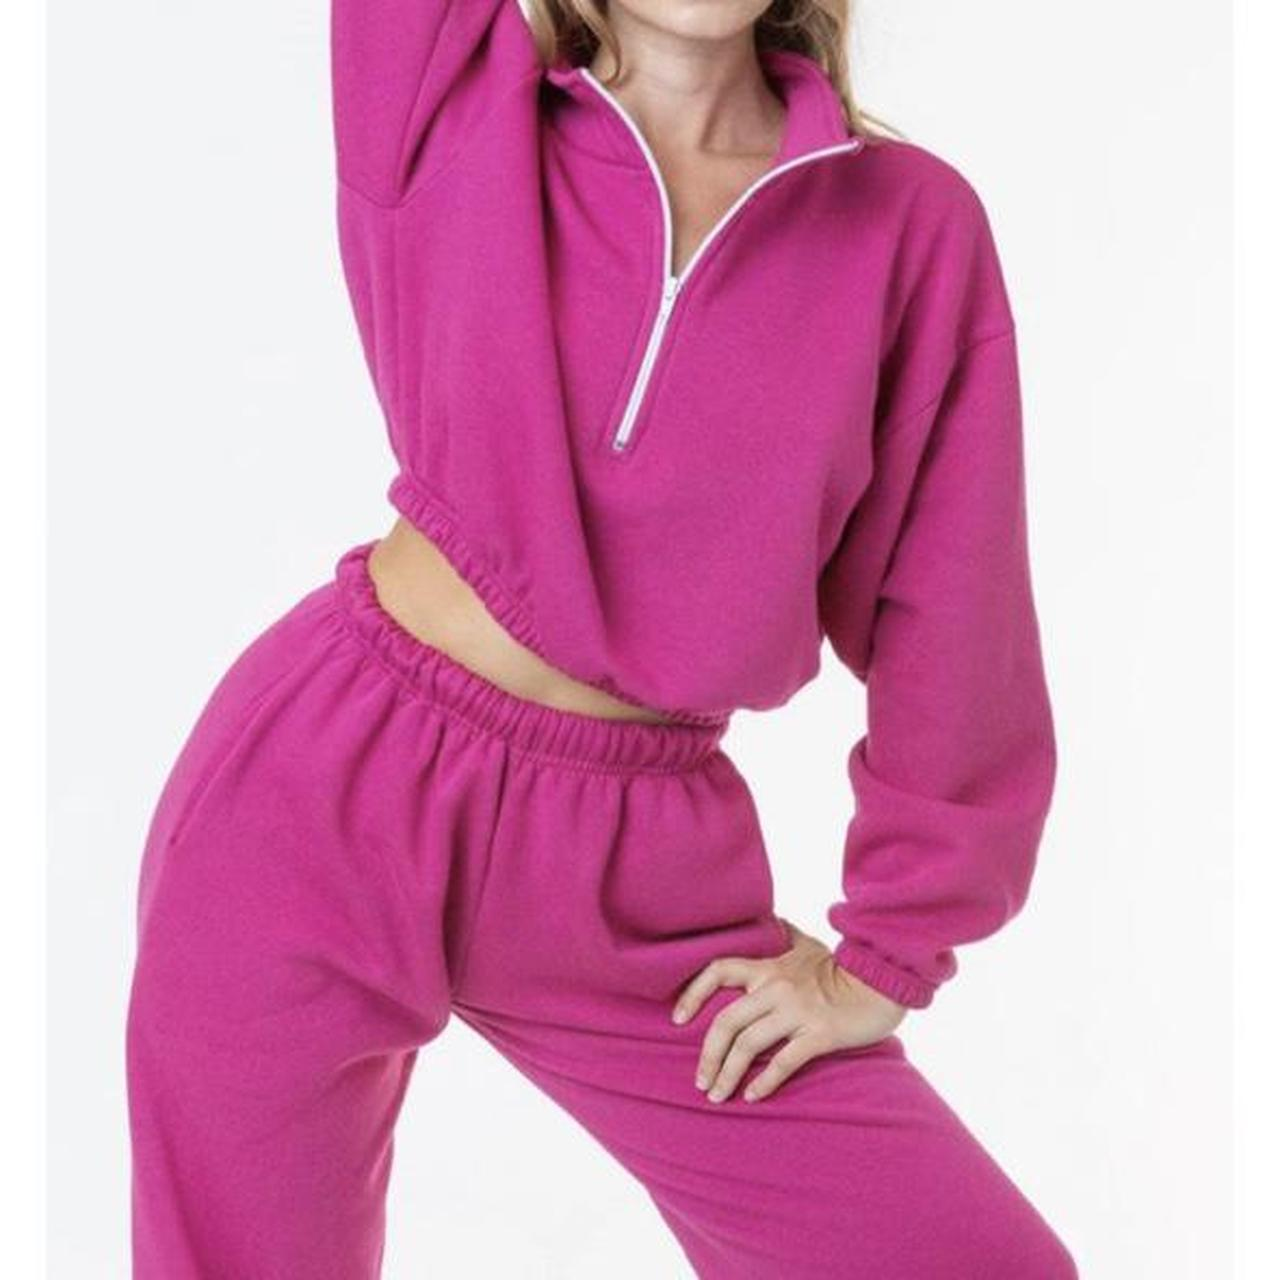 Product Image 1 - Los Angeles apparel. F394 -